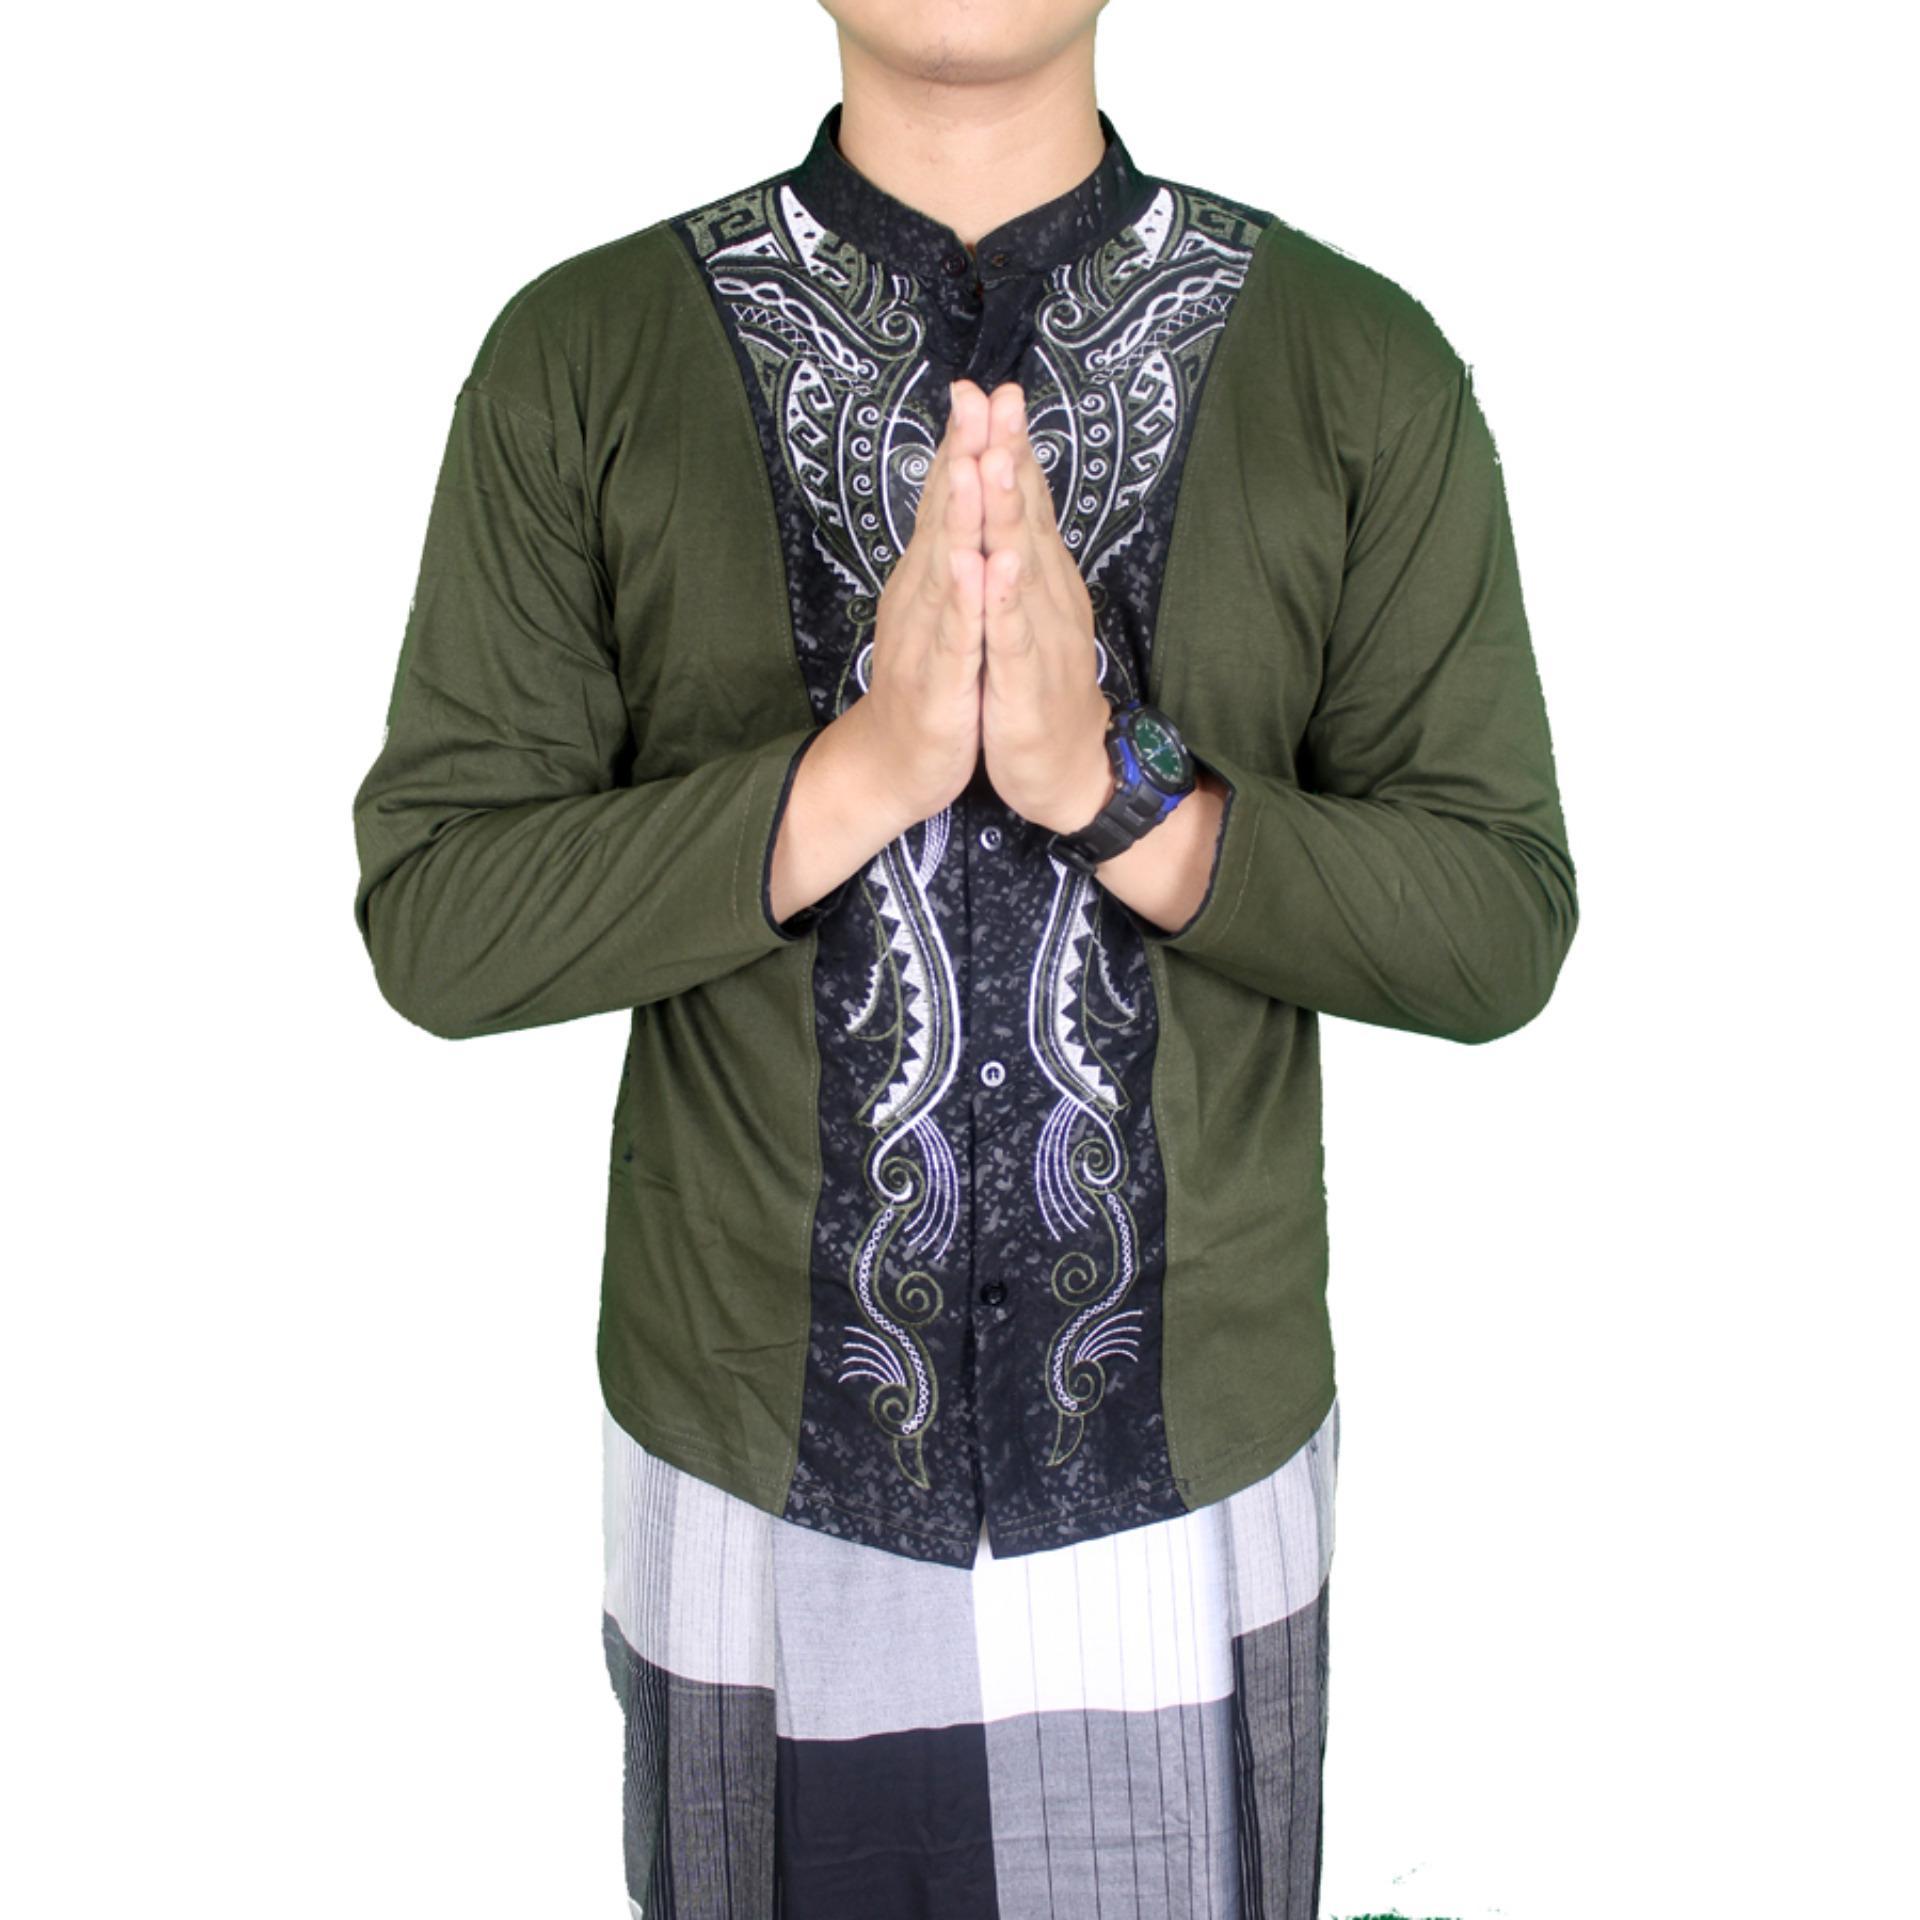 ... Gudang Fashion - Baju Koko Lengan Panjang Pria - Hijau